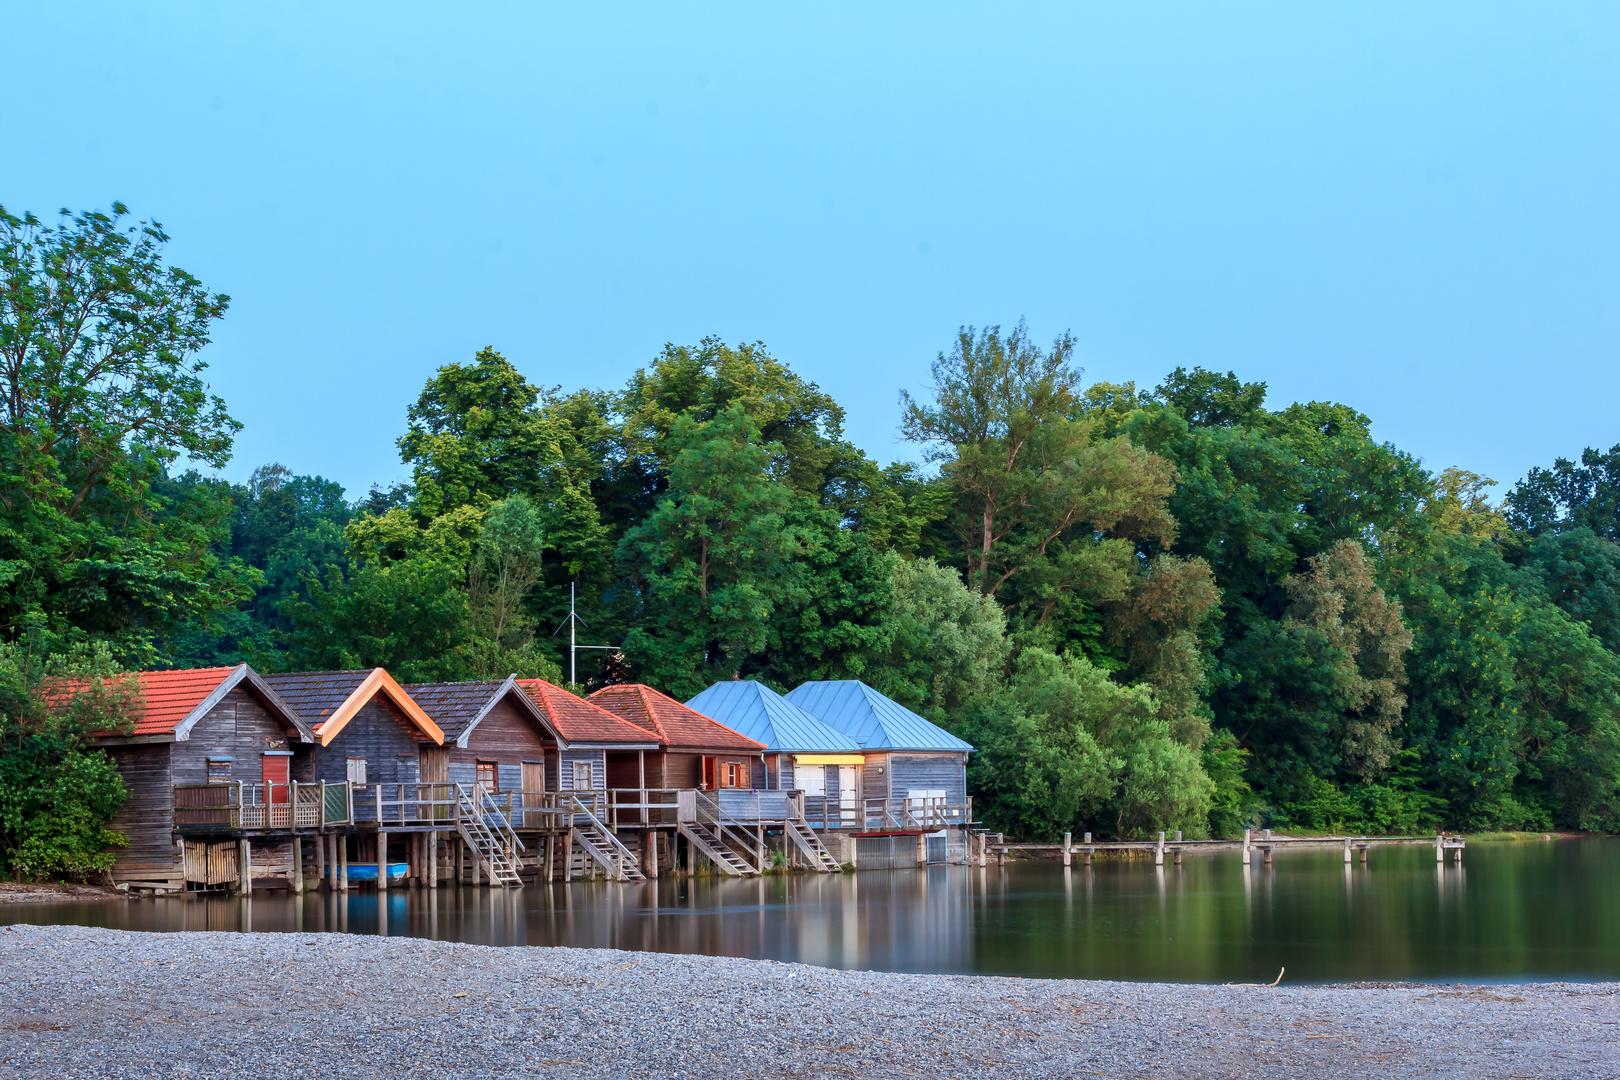 Bootshütten am Ammersee 2